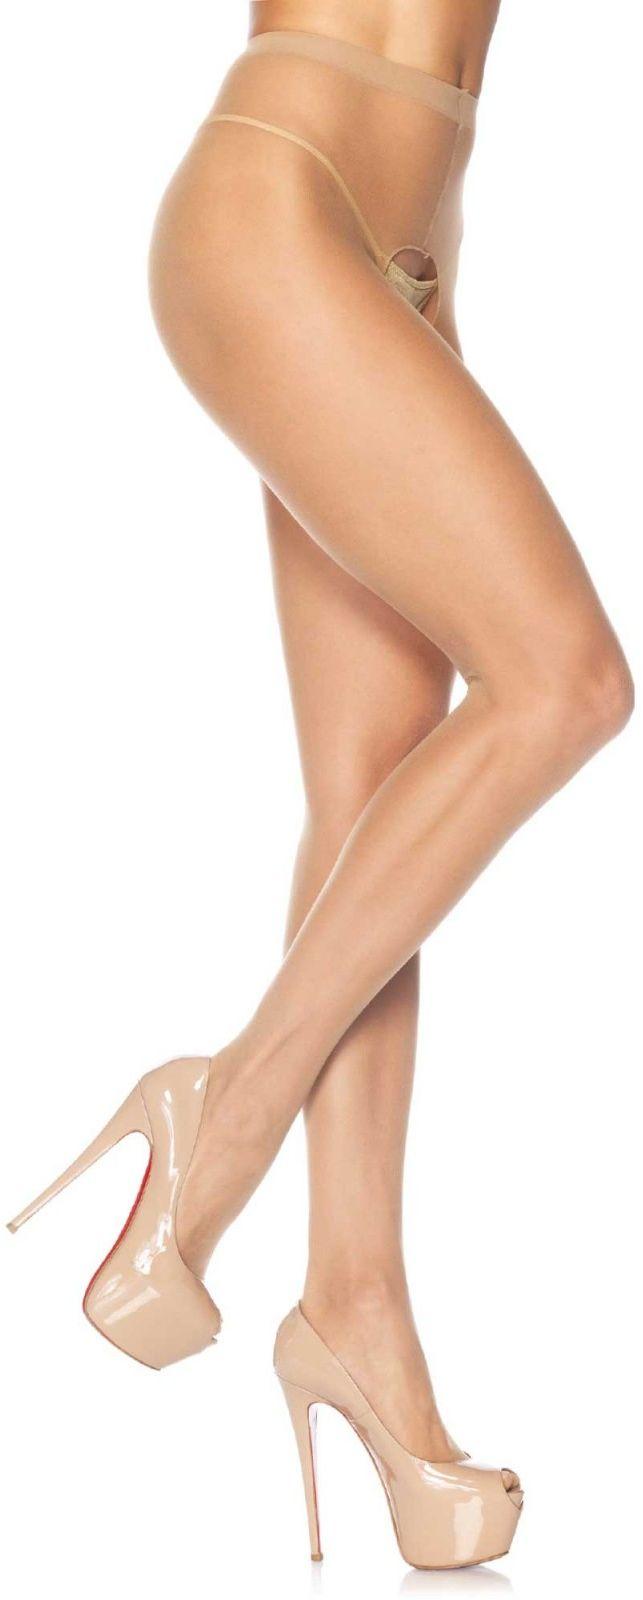 Leg Avenue Sheer Crotchless Pantyhose 1905 Beige